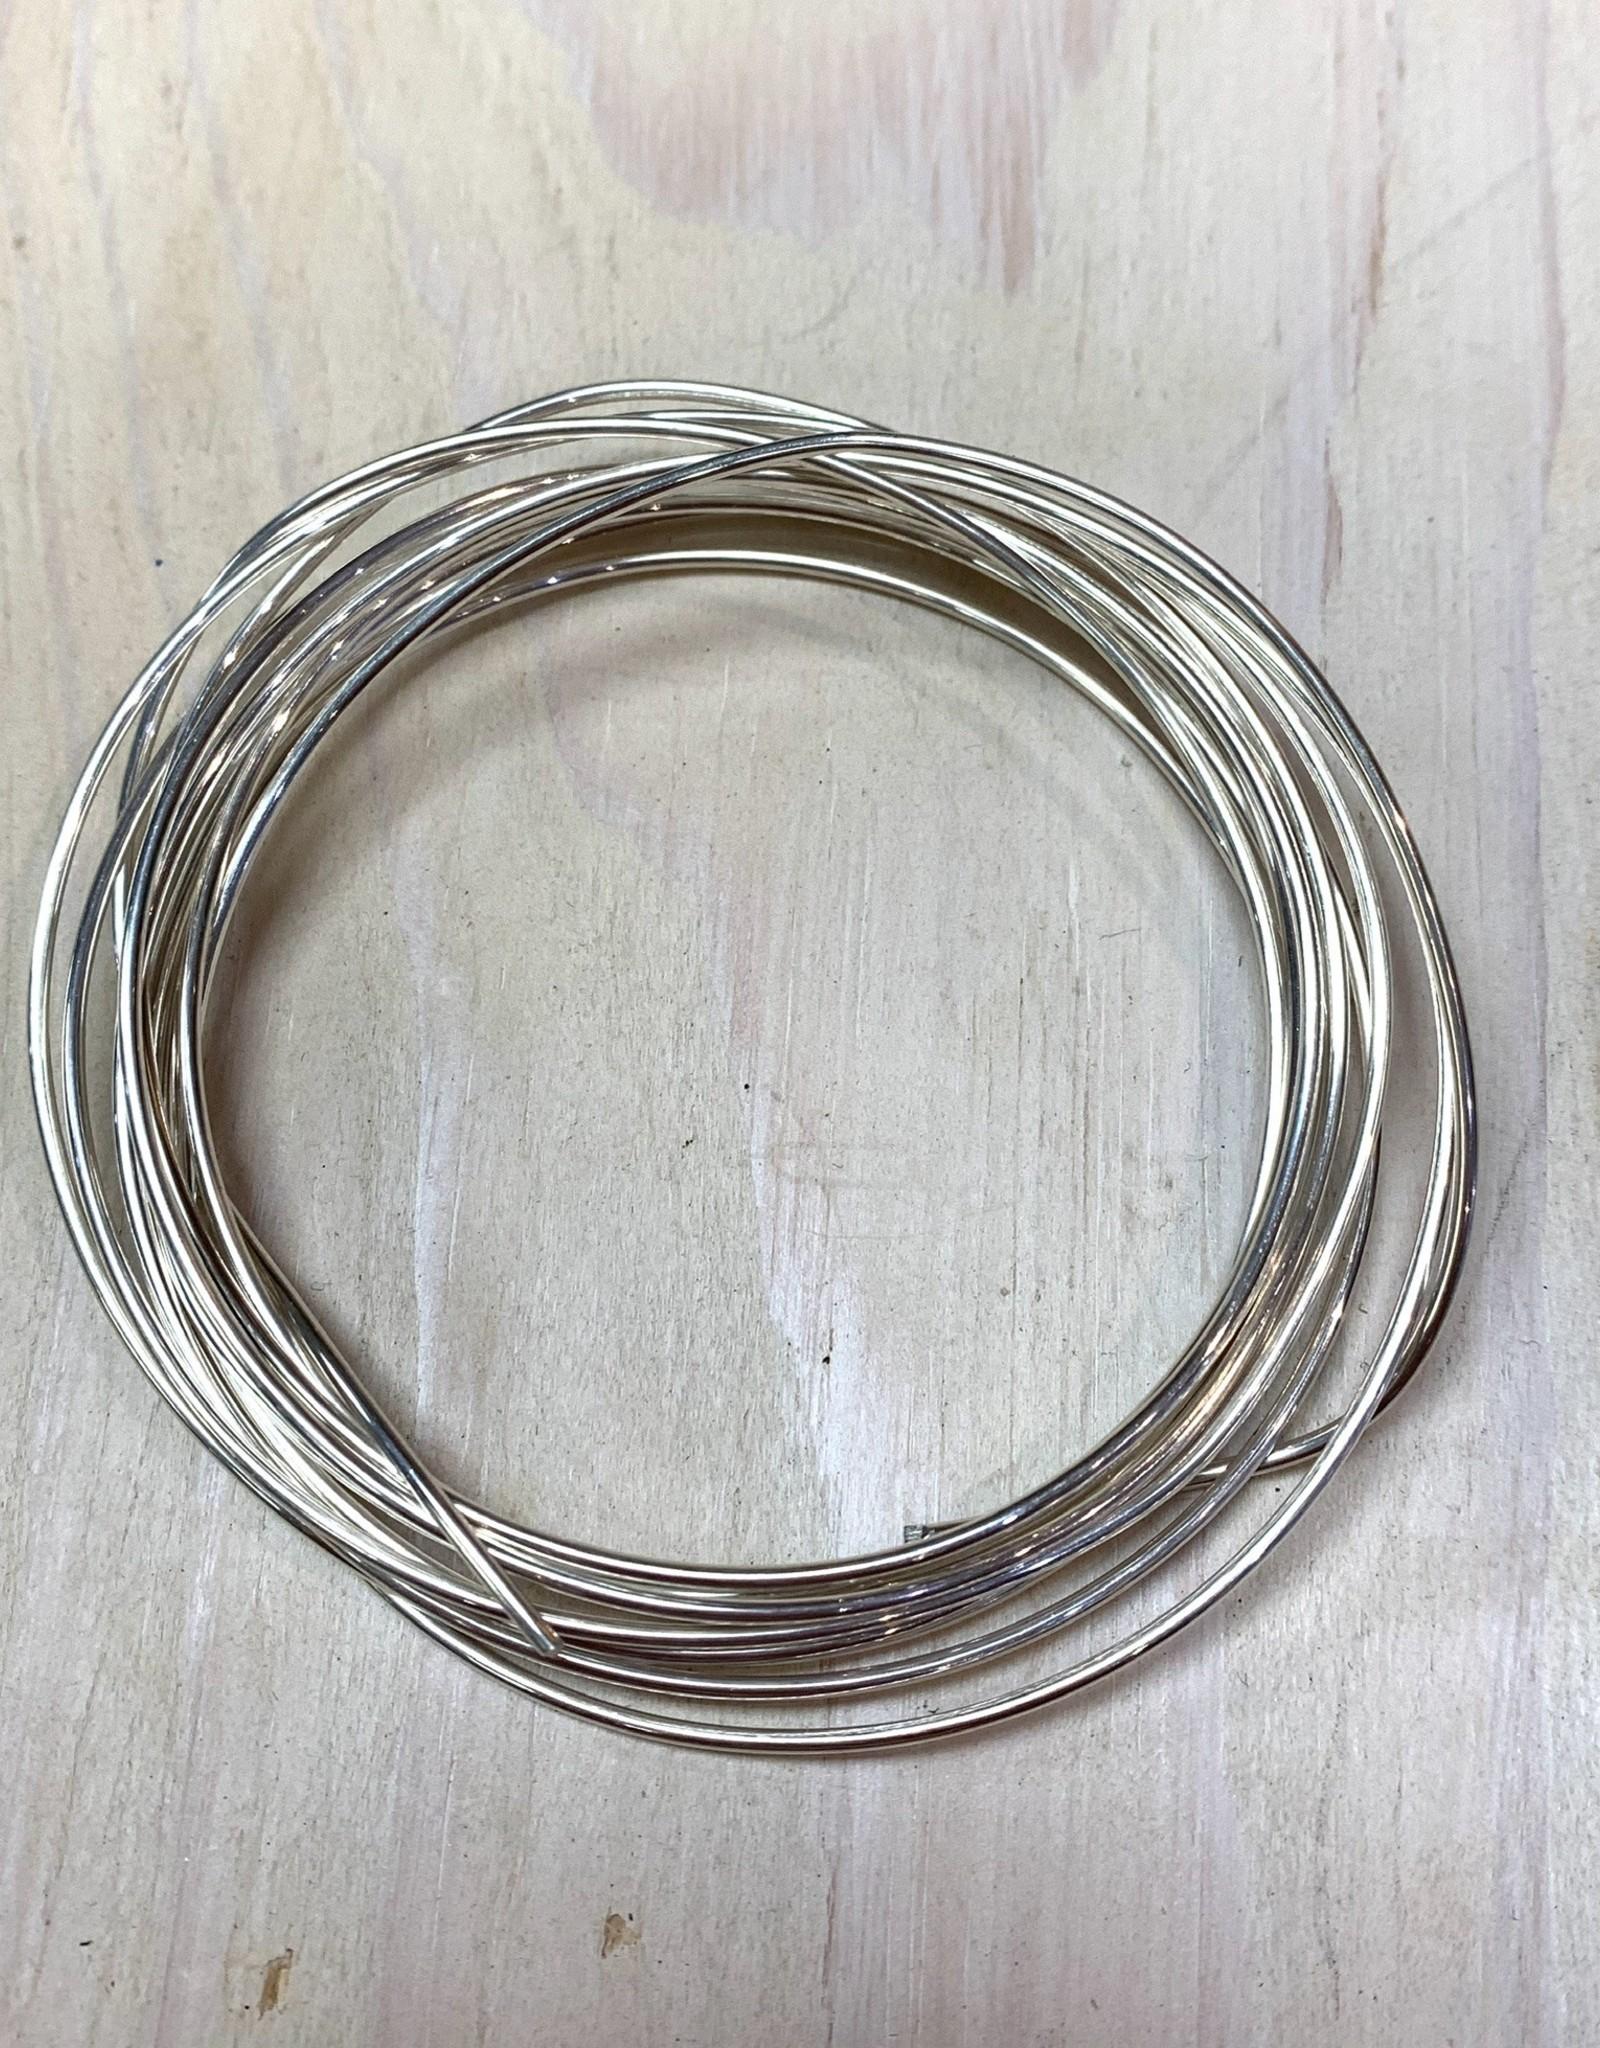 16ga Round Wire Sterling Silver 1oz DS